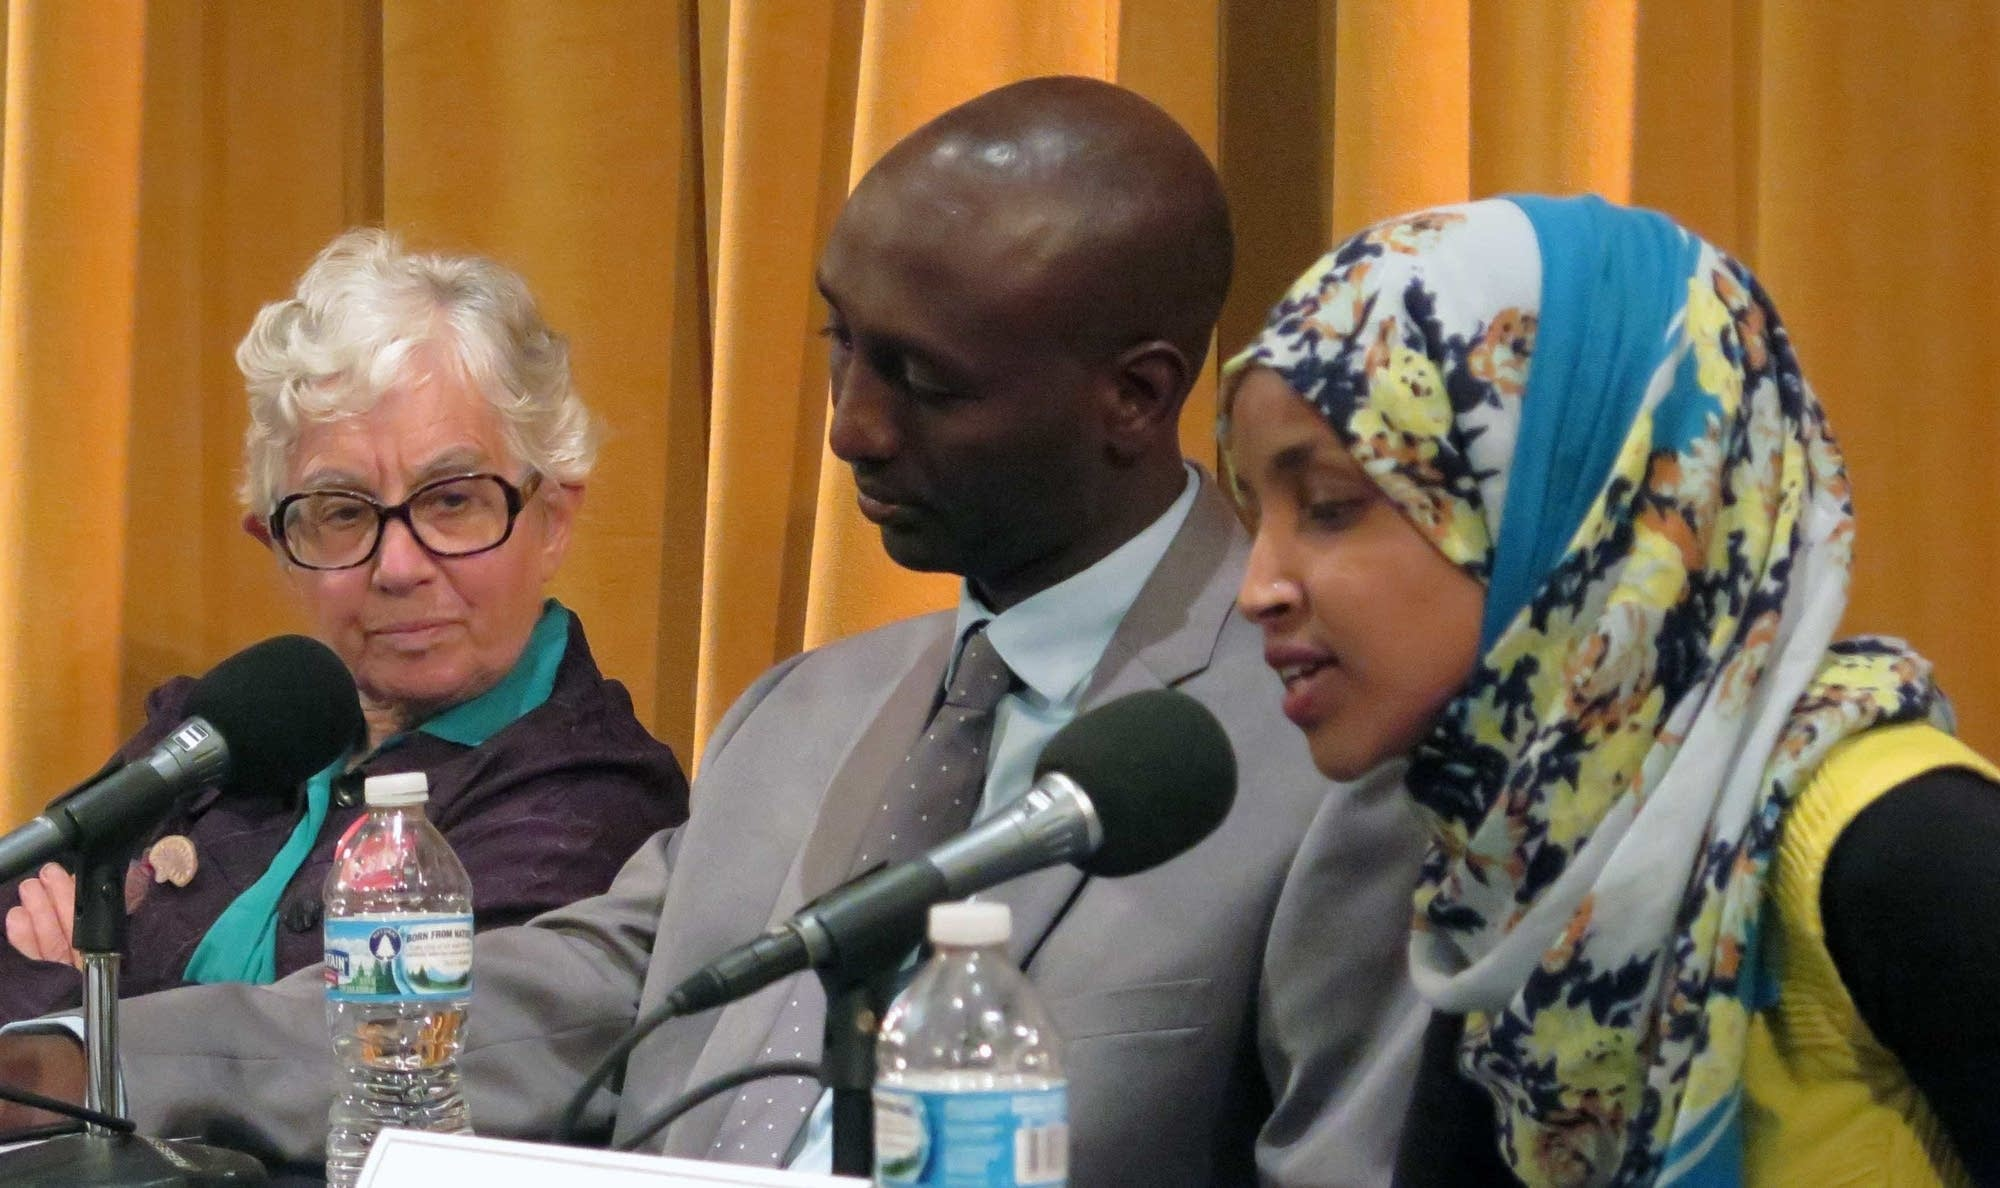 Phyllis Kahn, Mohamud Noor and Ilhan Omar